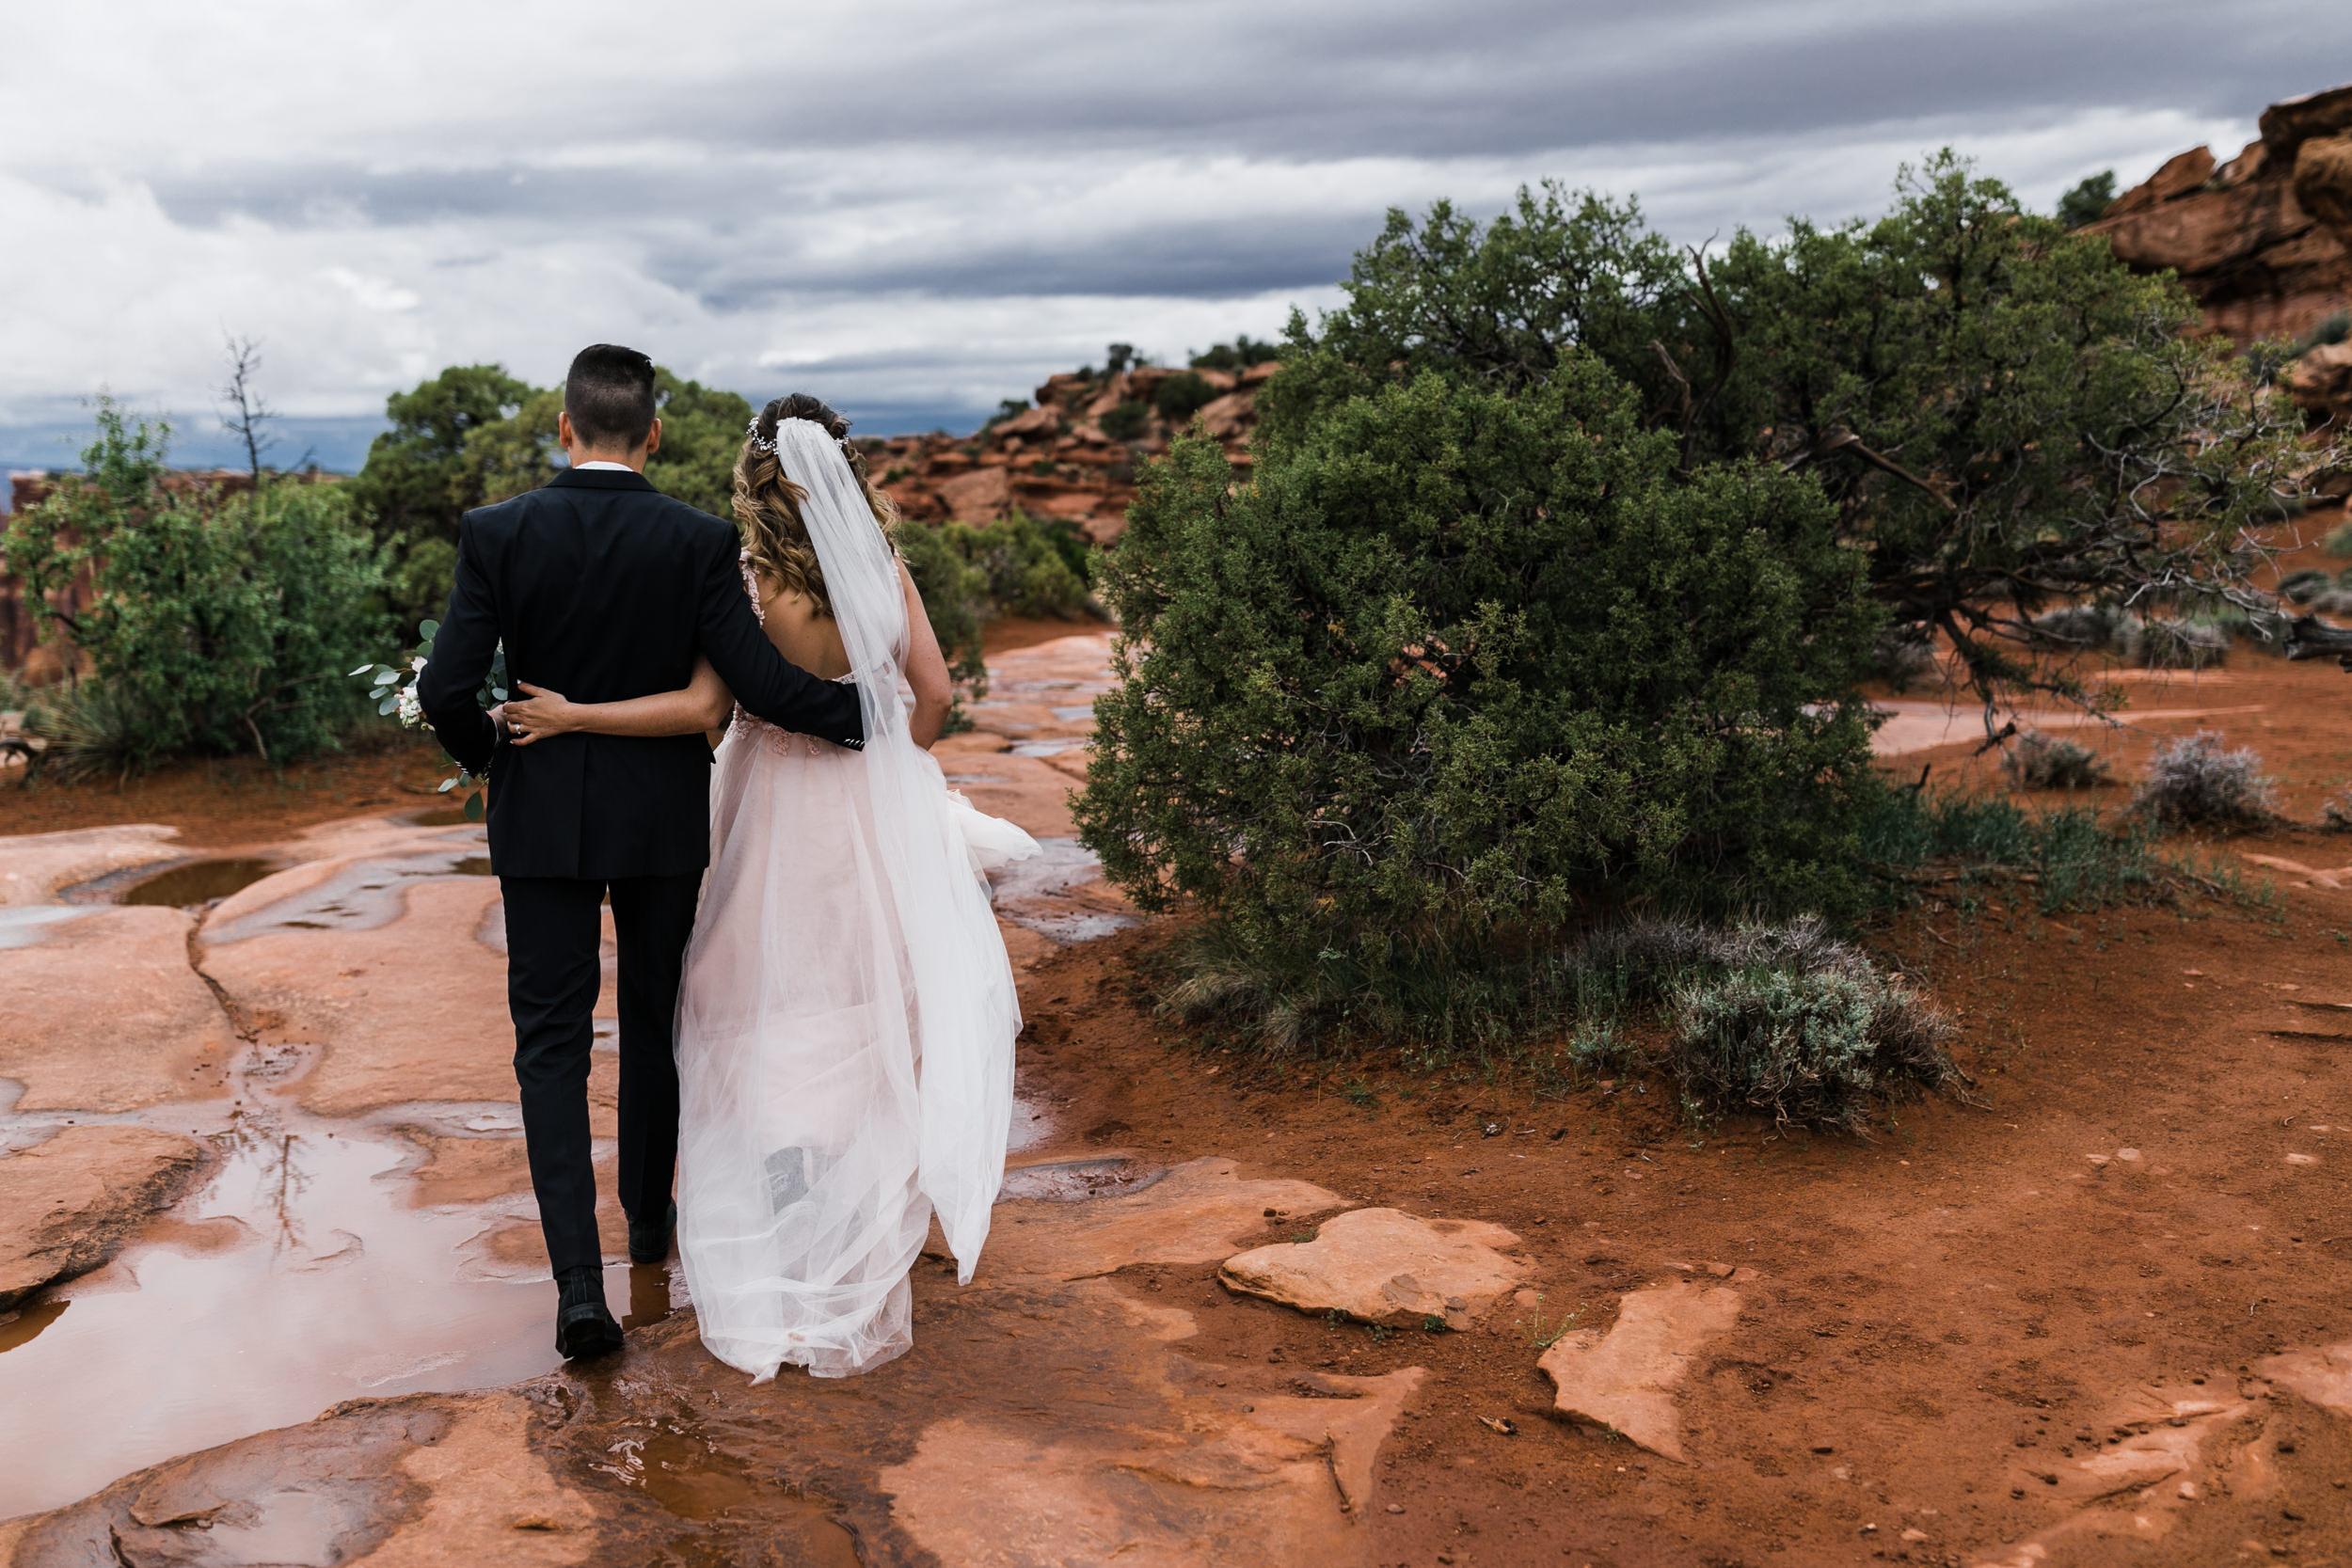 Hearnes-Elopement-Photography-Canyonlands-National-Park-Moab-Wedding-3.jpg